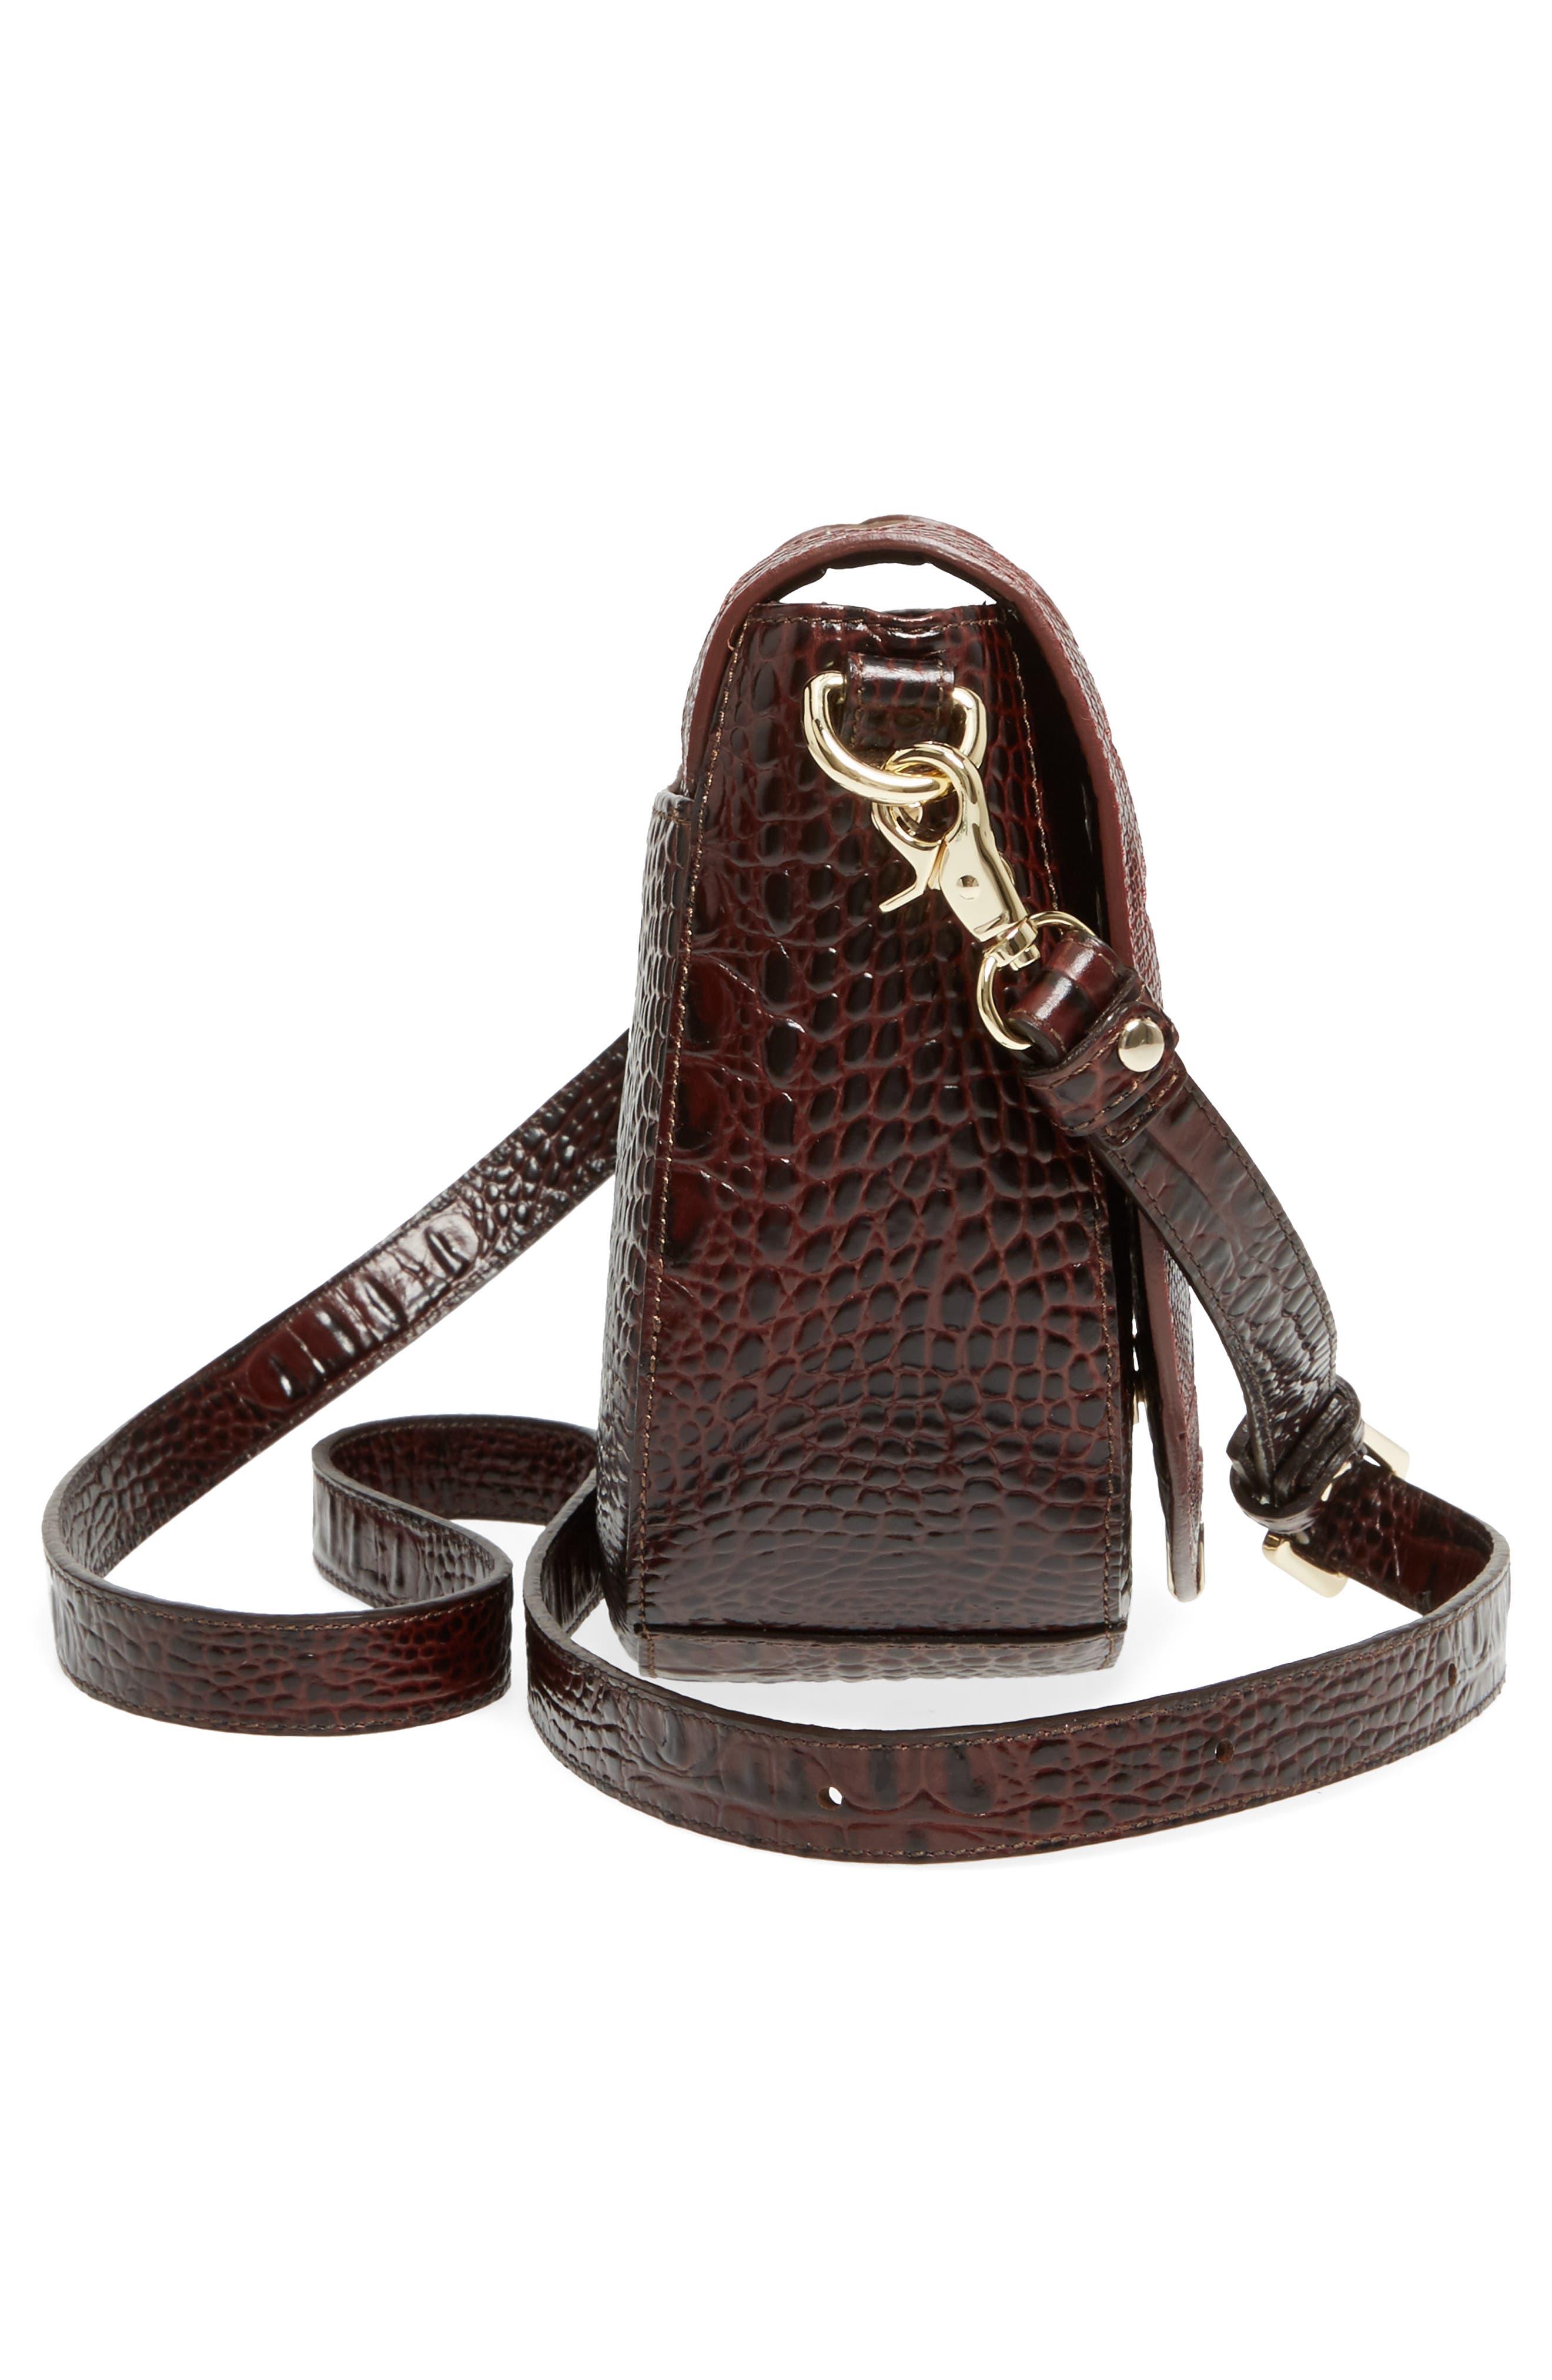 Verona Mini Sonny Leather Crossbody Bag,                             Alternate thumbnail 5, color,                             Red